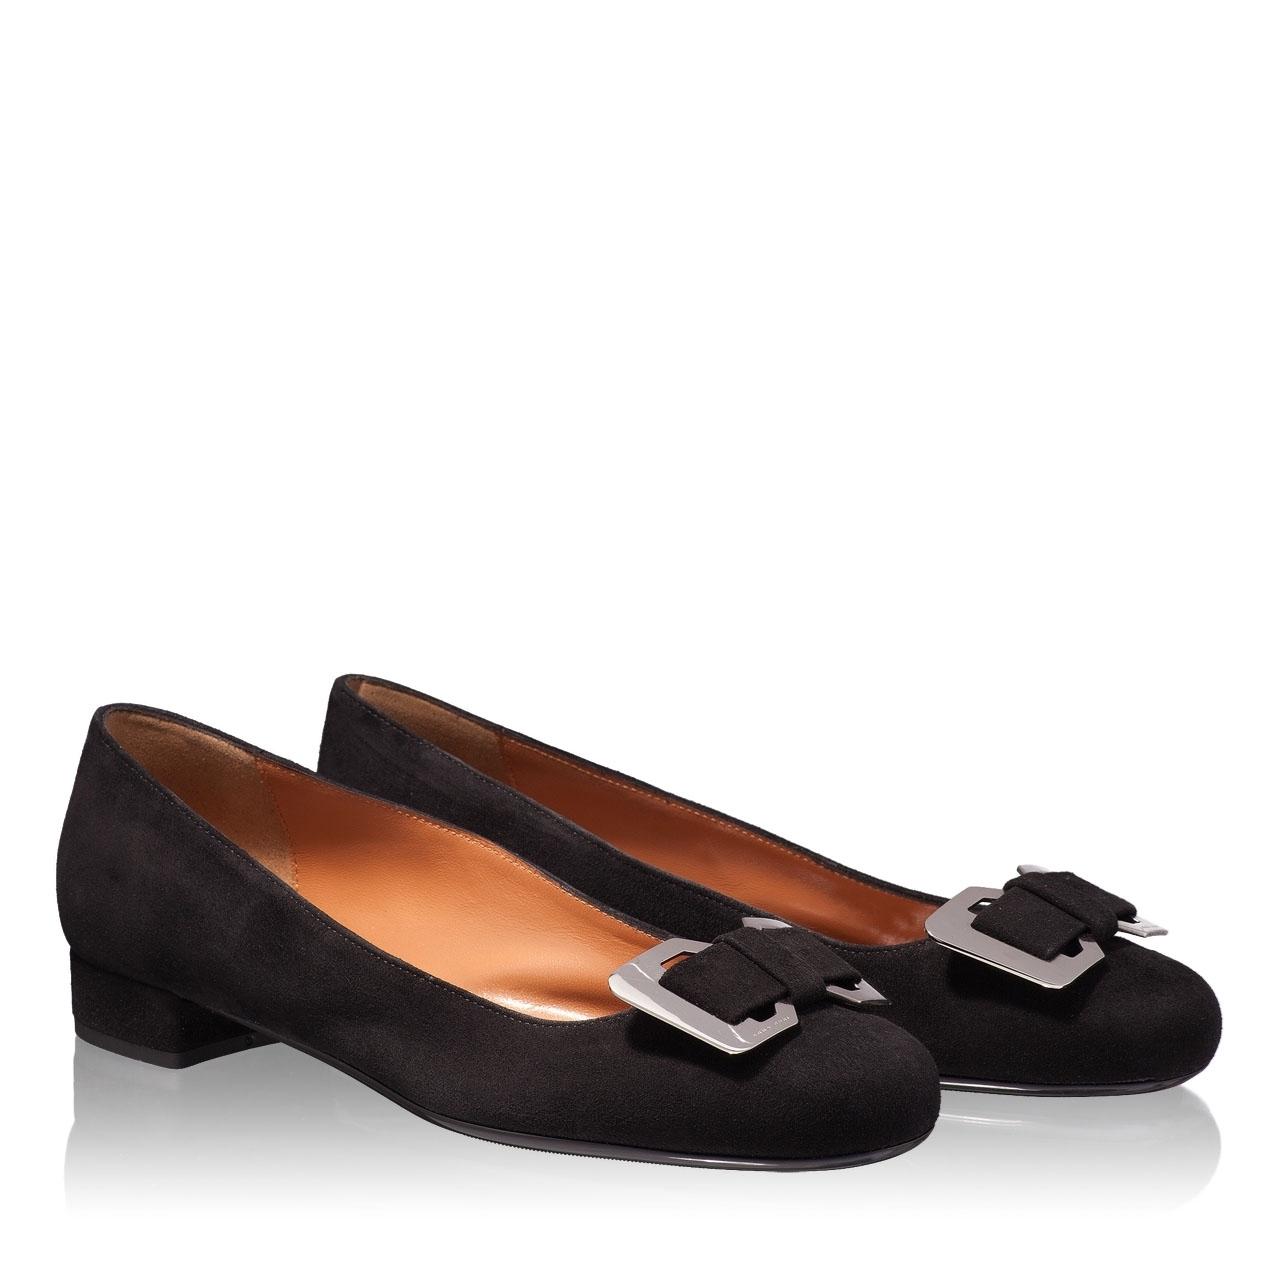 Pantofi Eleganti Dama 4706 Camoscio Nero